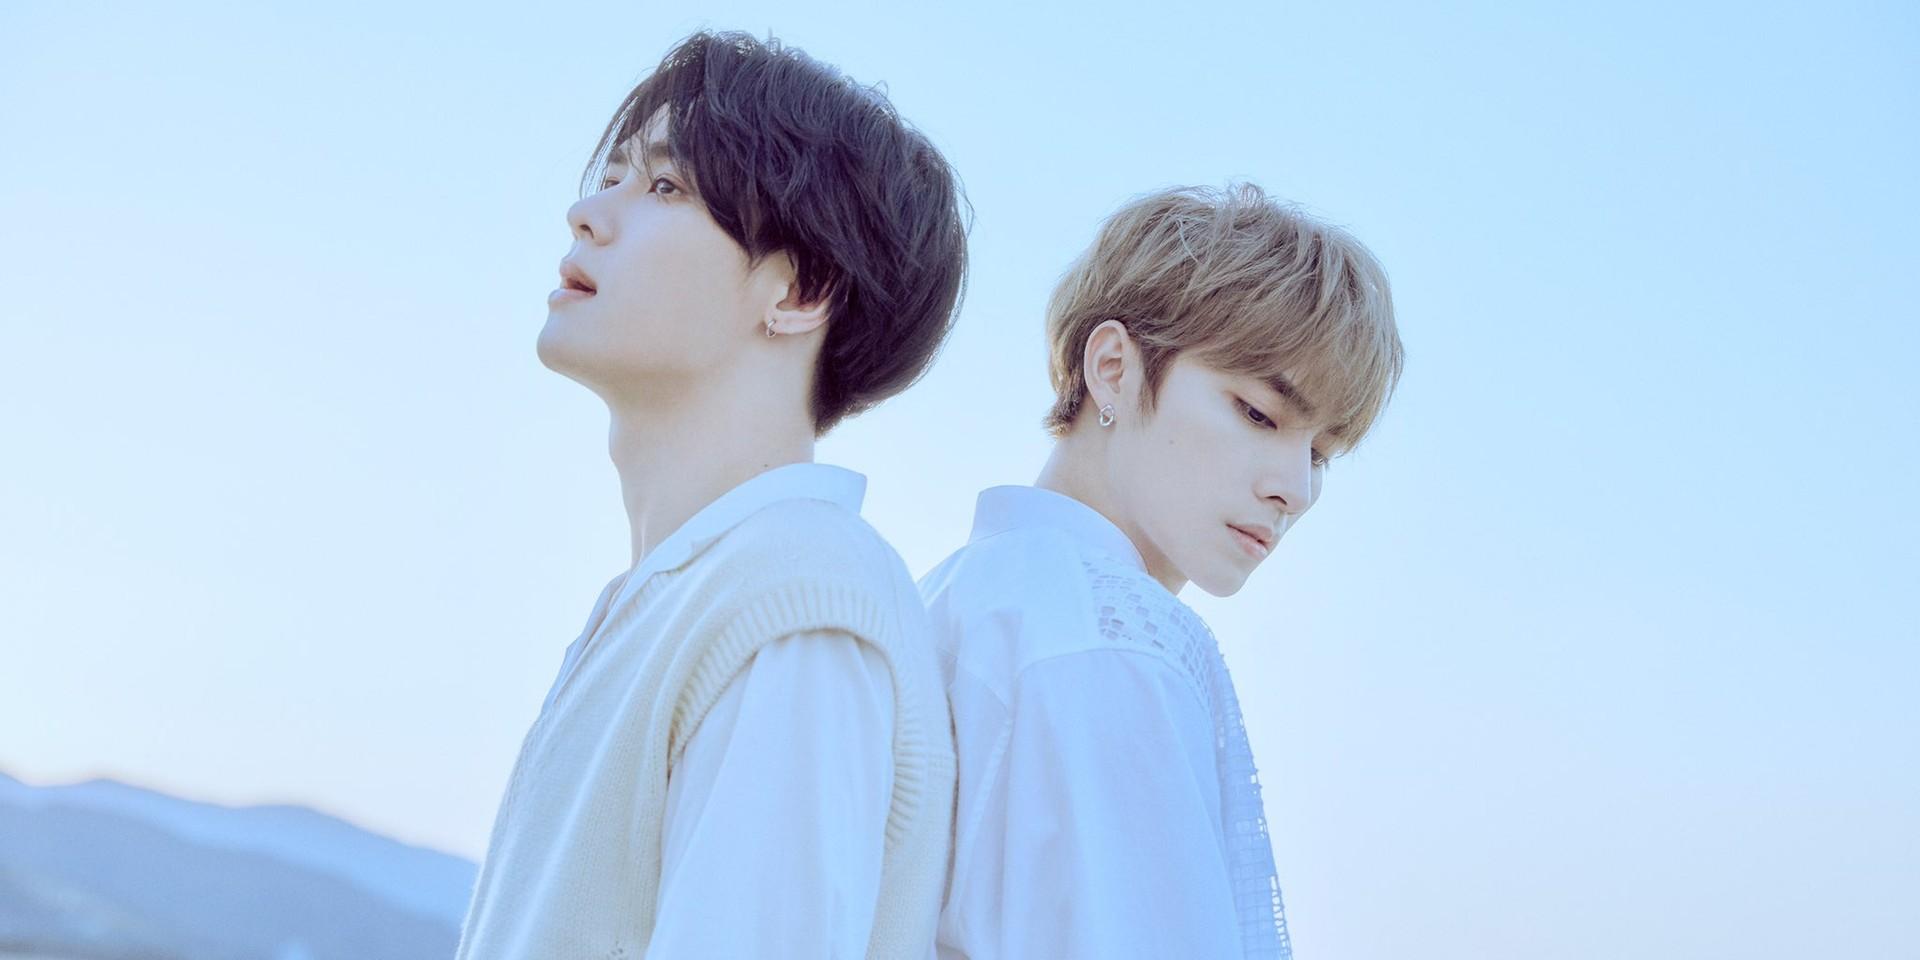 WayV's sub-unit KUN&XIAOJUN unveil their debut single 'Back To You' – watch